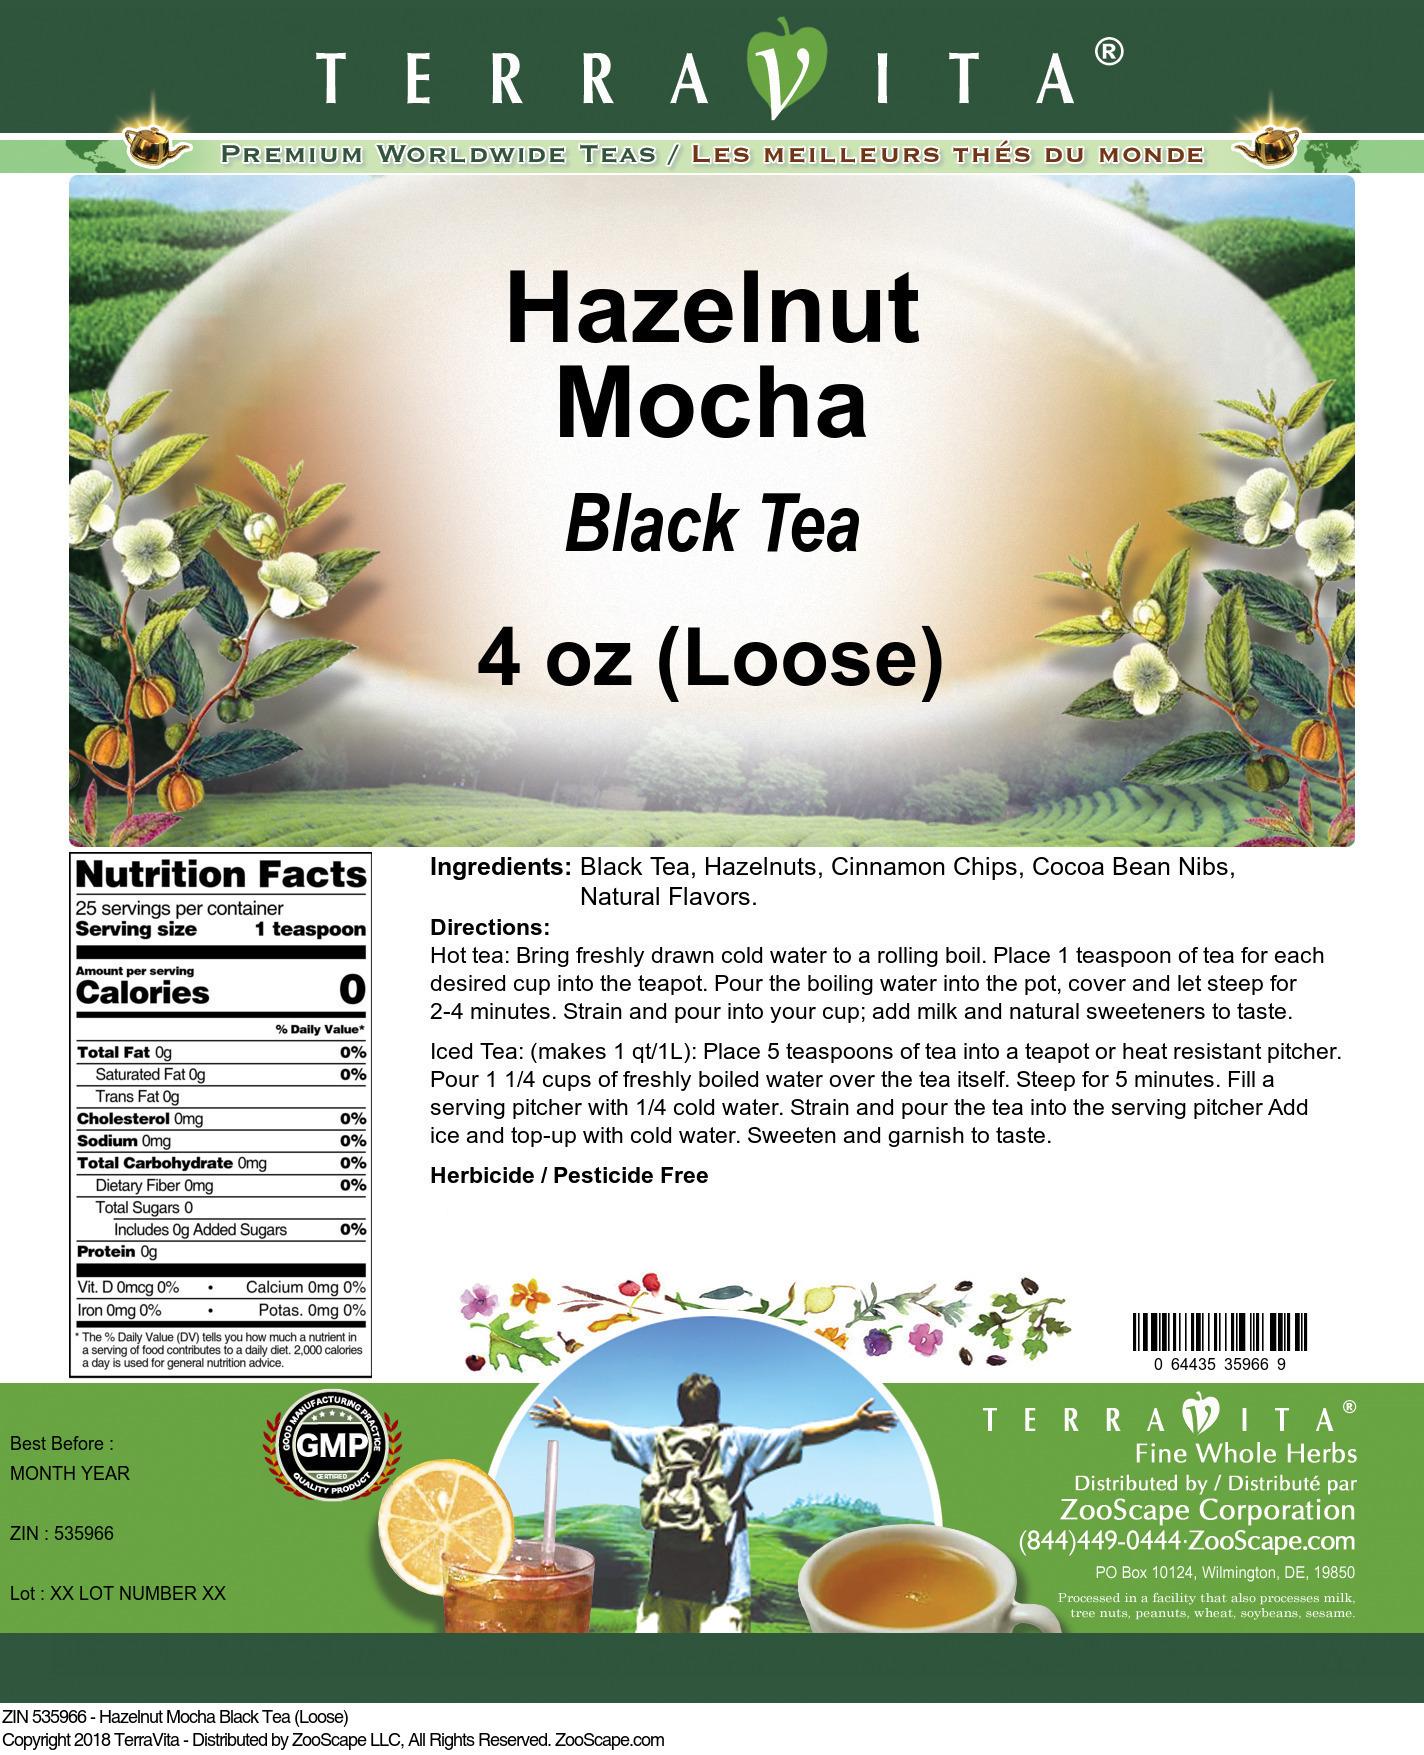 Hazelnut Mocha Black Tea (Loose)